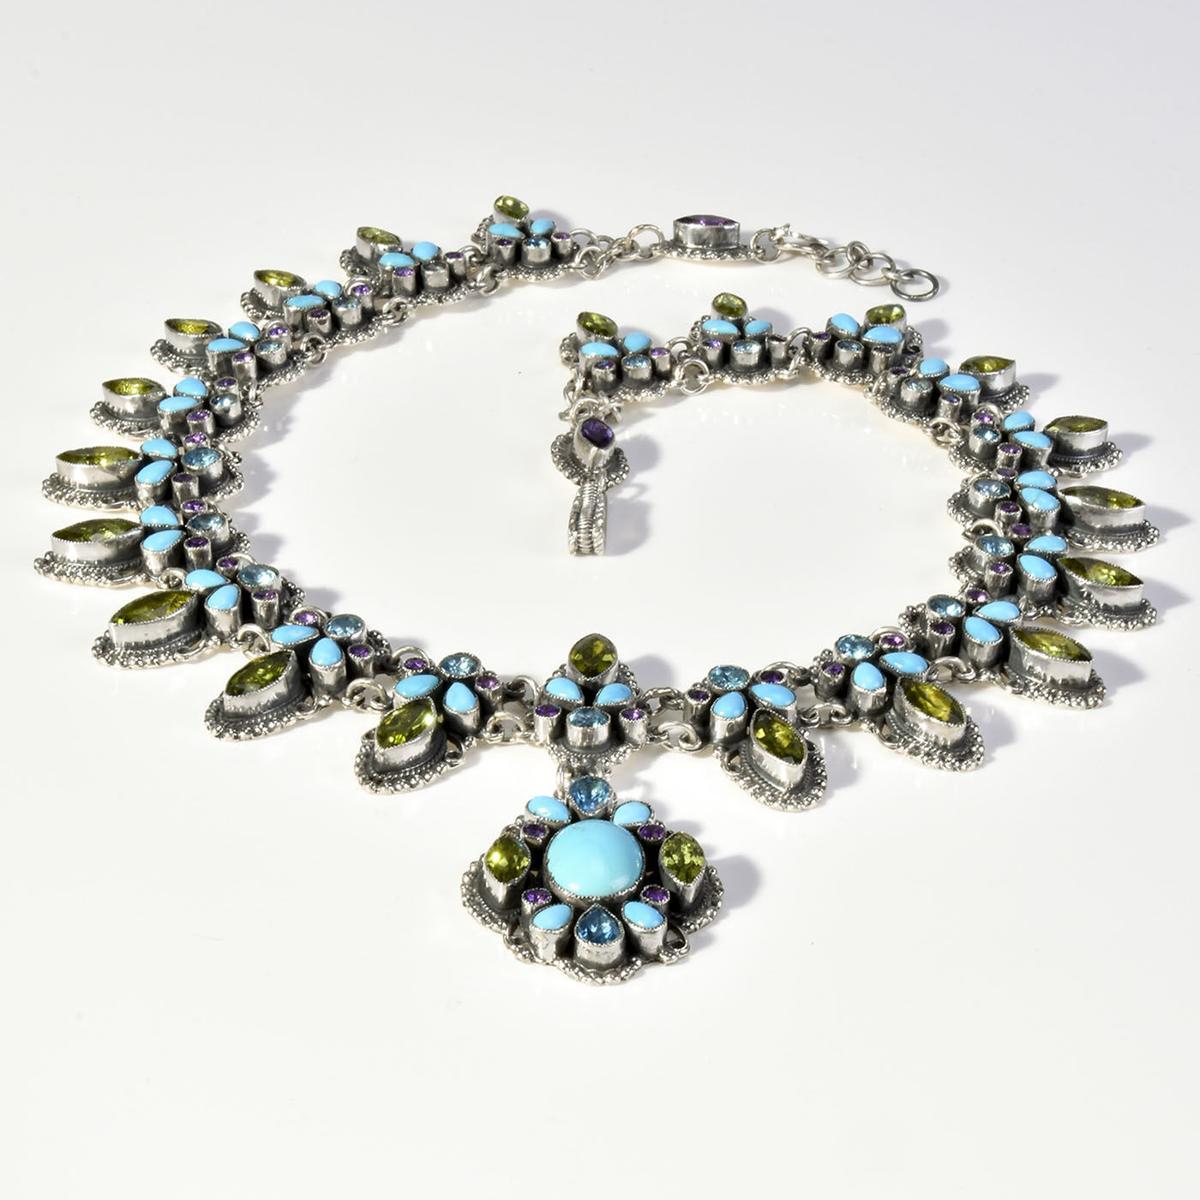 Sparkling Southwest Necklace by Leo Feeney